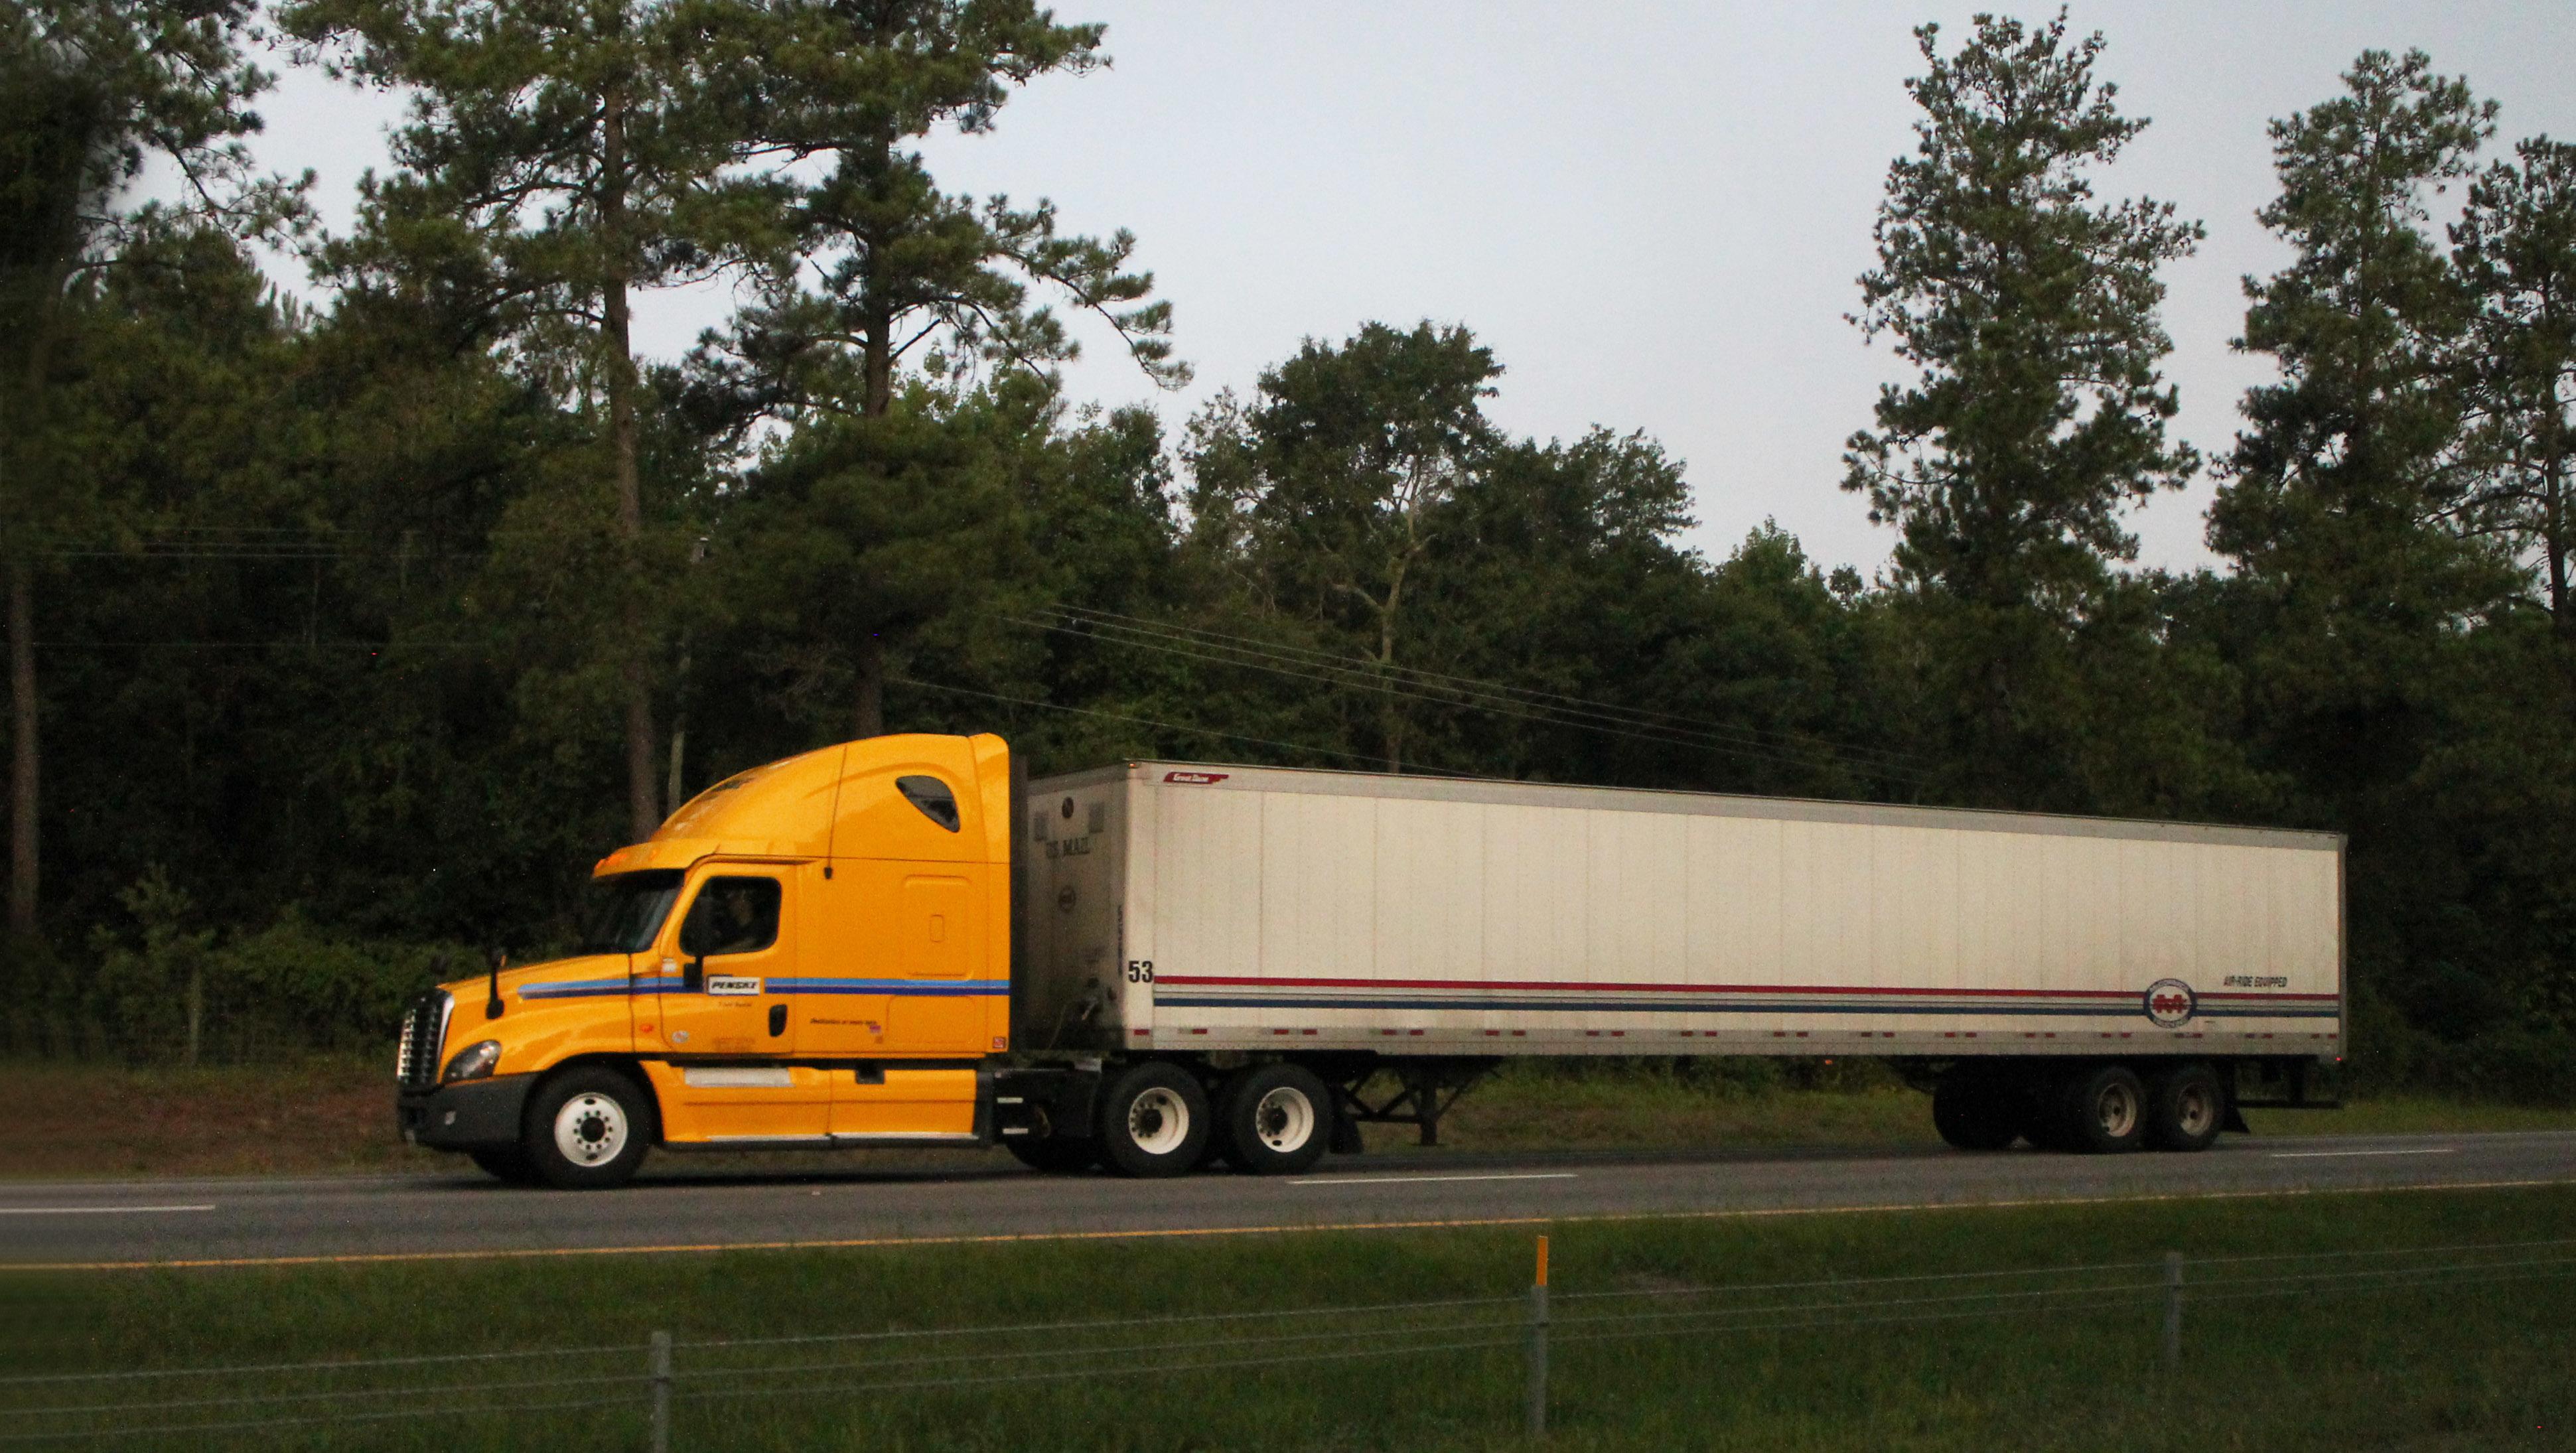 Penske auto transport trailer rental / Yes man subtitles english online